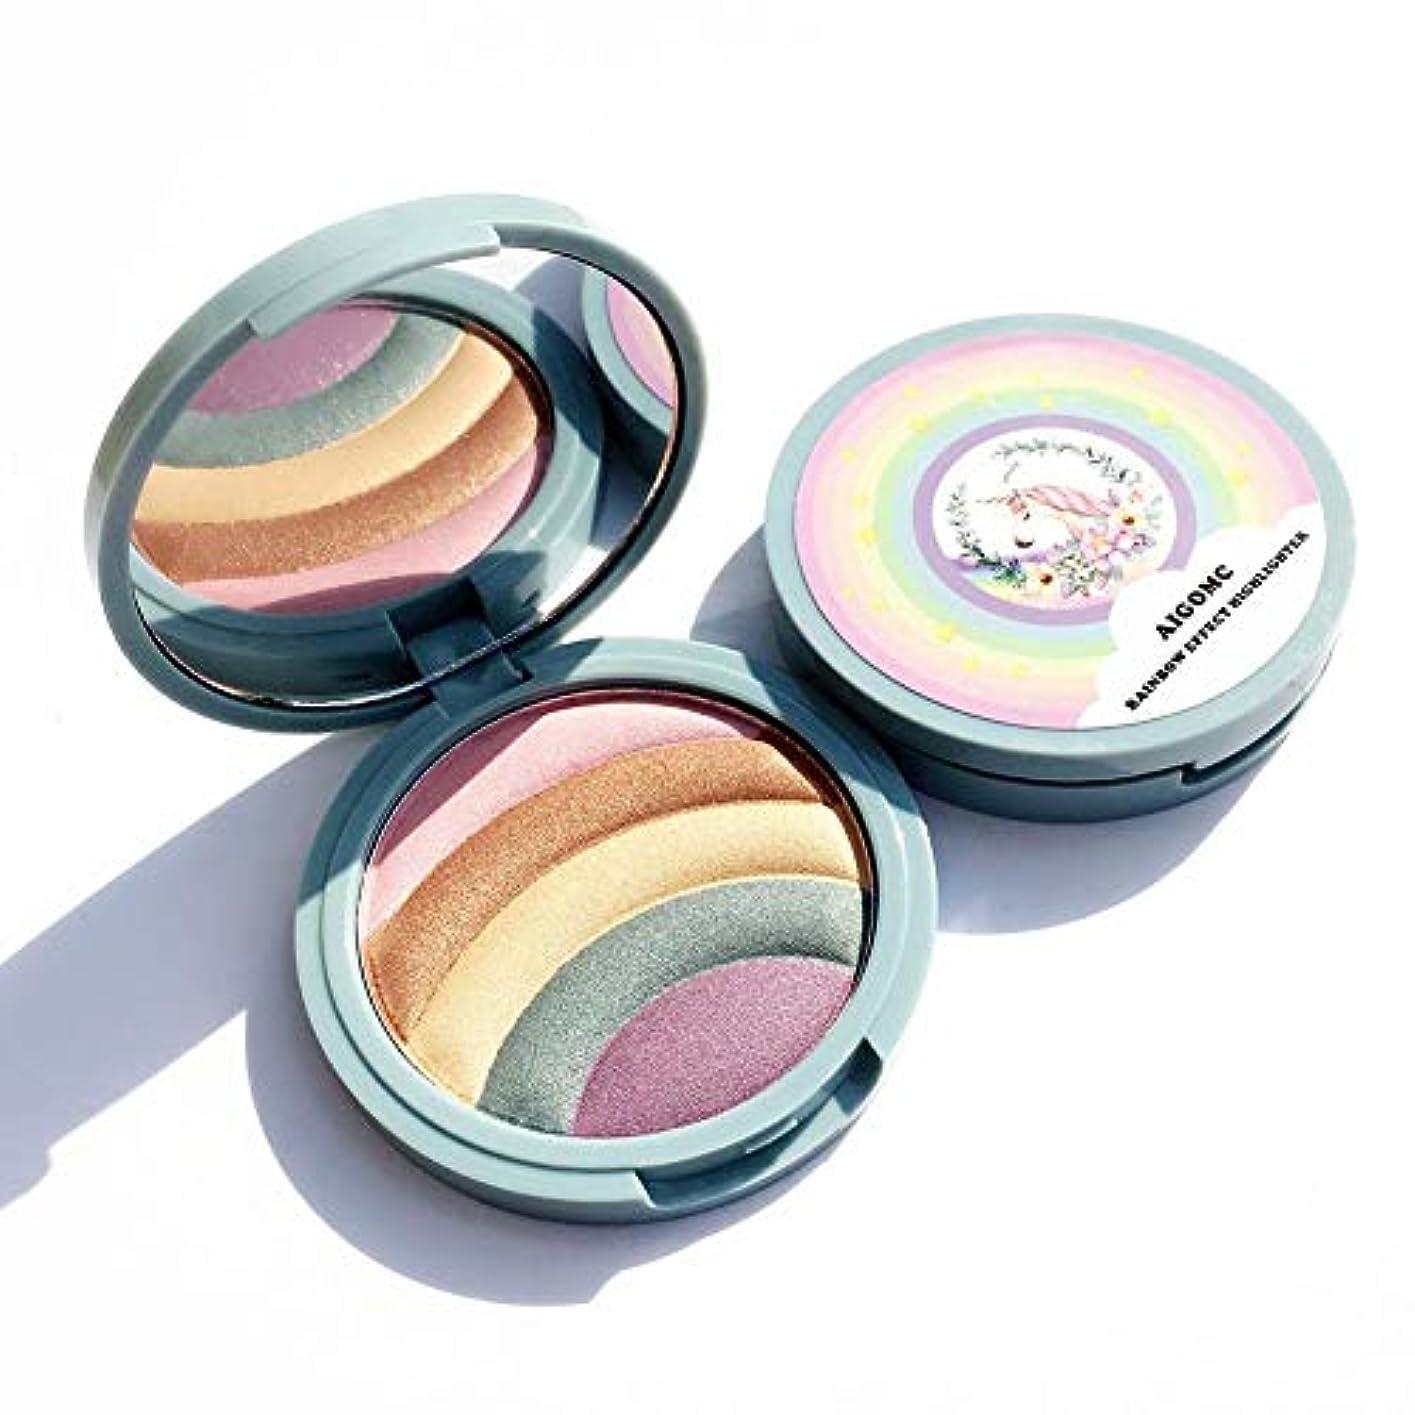 Brill(ブリーオ)最高のプロアイシャドウマットパレットメイクアイシャドウプロフェッショナル完璧なファイル暖かいナチュラルニュートラルスモーキーパレットアイメイクアップシルキーパウダー化粧品5色